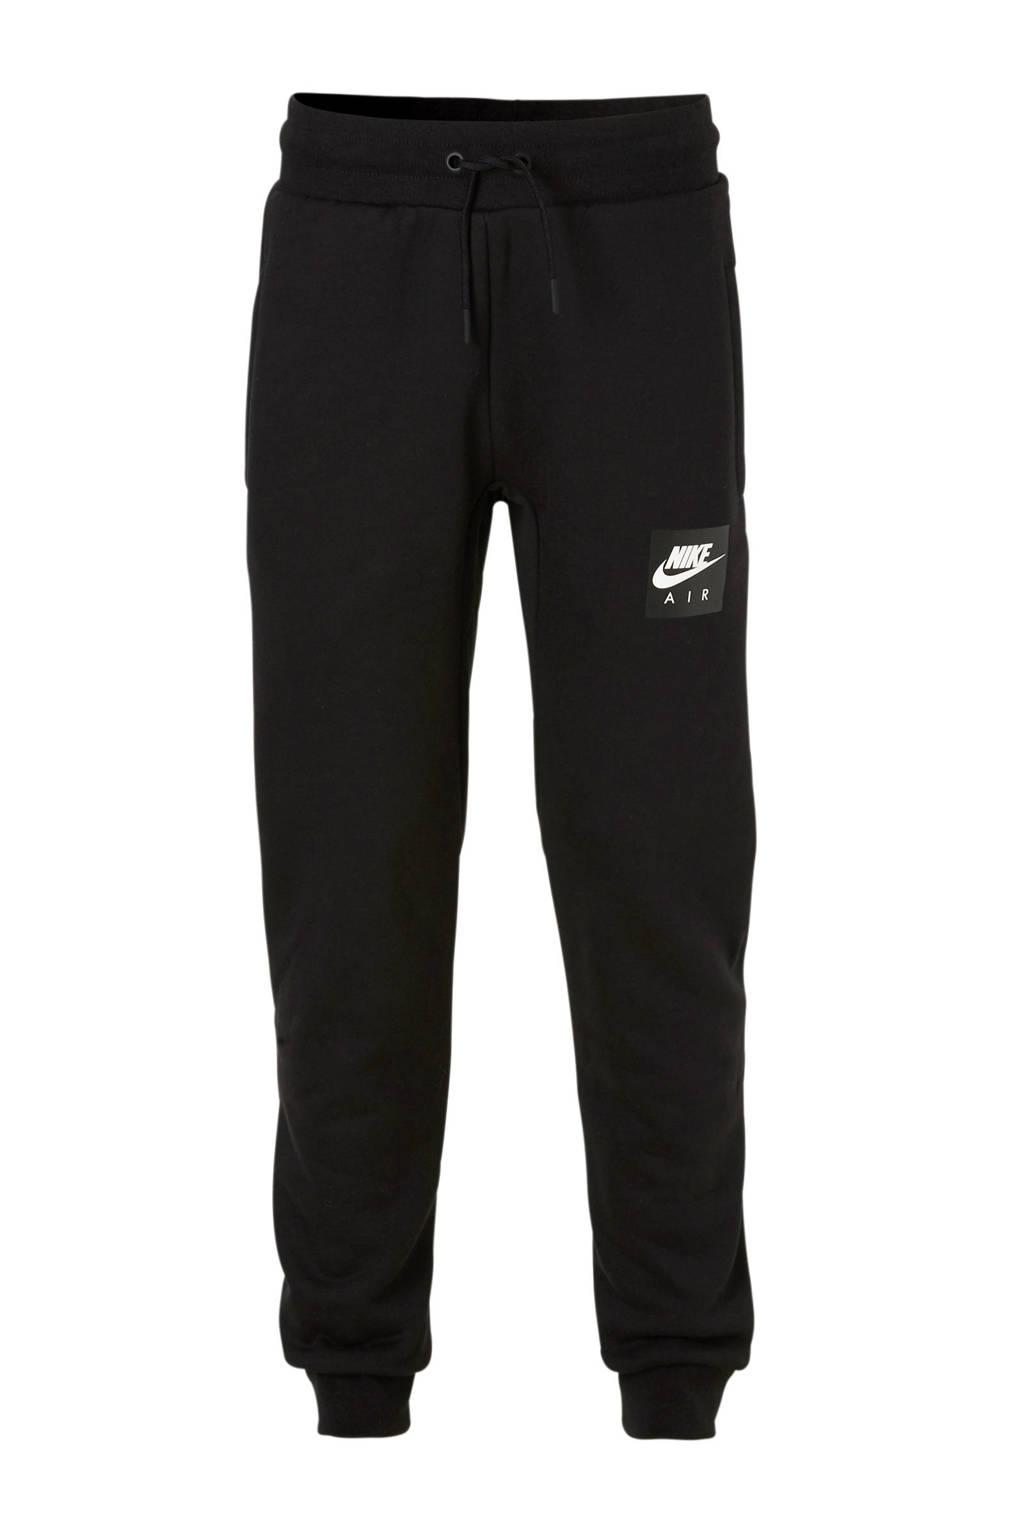 Nike   B Air Pant joggingbroek zwart, Zwart